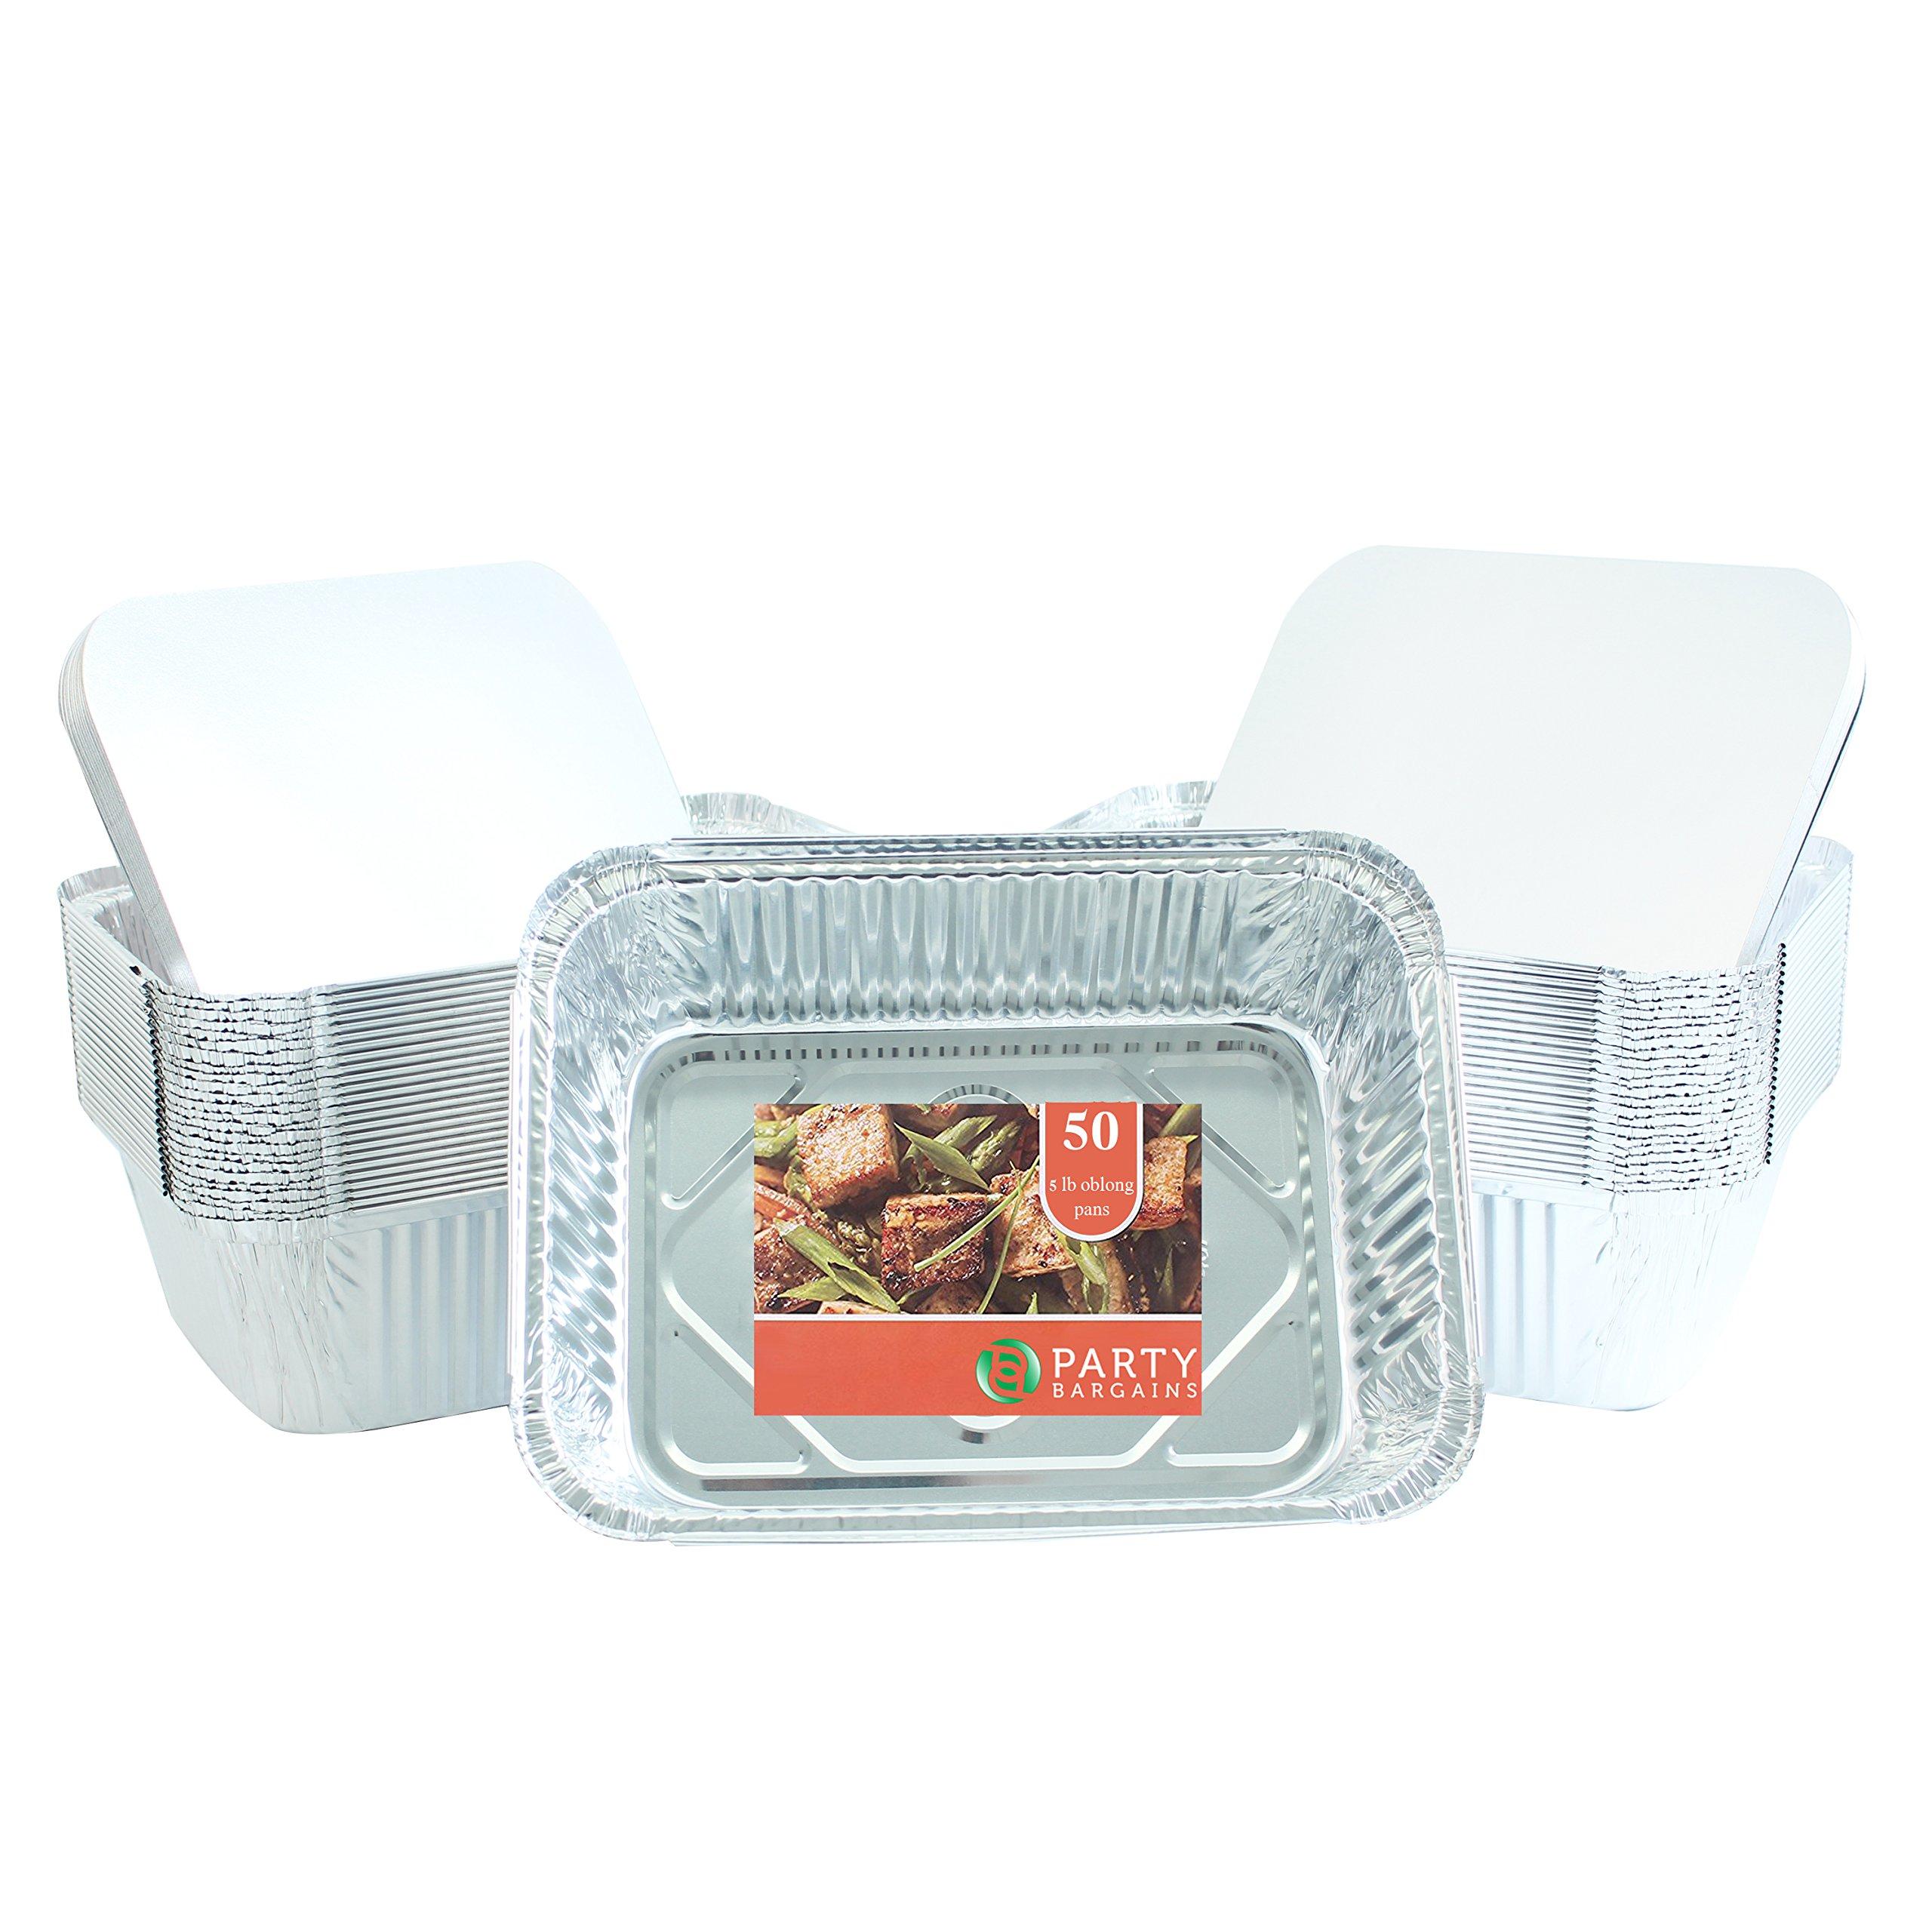 Party Bargains Premium Quality Durable, 9 X 7 Aluminum Foil Pans 5 Lb Capacity with Board Lids (50 Count) by Party Bargains (Image #1)